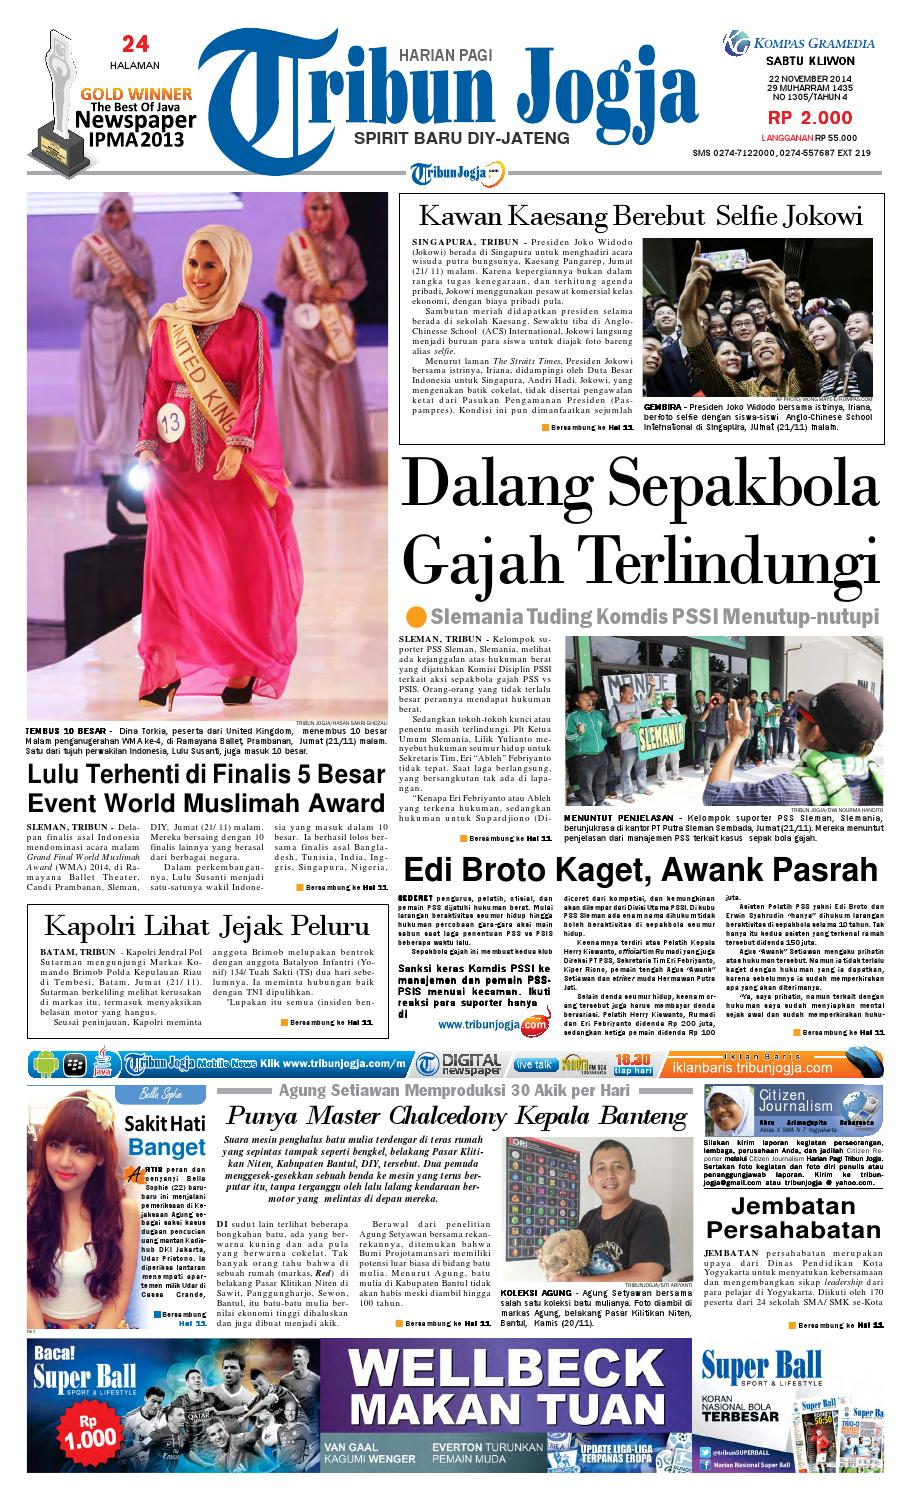 Tribunjogja 22 11 2014 By Tribun Jogja Issuu Produk Ukm Bumn Bale Sehat Teh Rosella Merah 3 Box